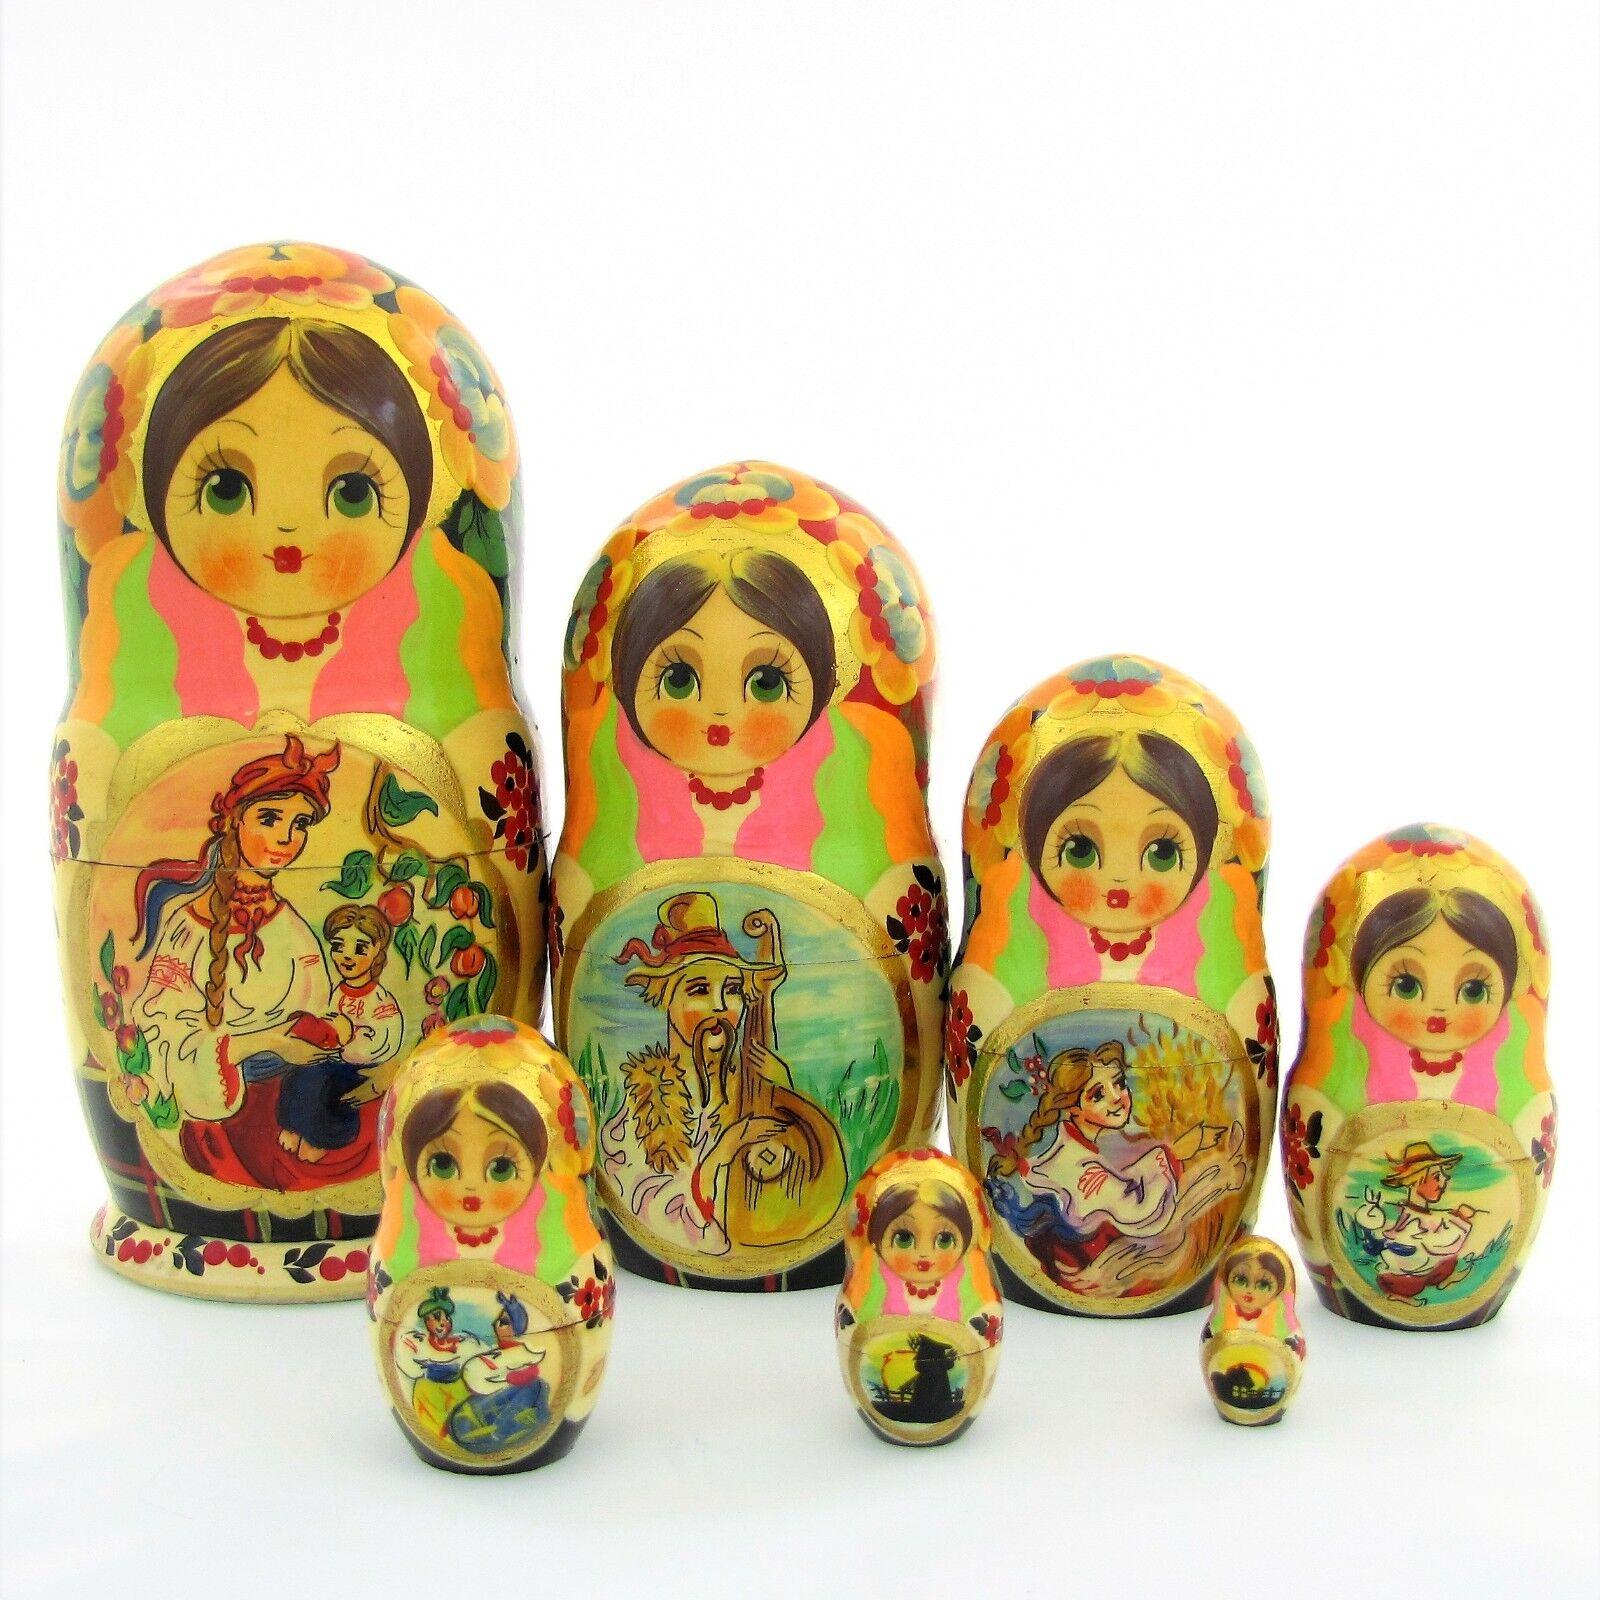 7 Poupées russes H21 peint main signé Matriochka Gigognes Nested Doll Matrioshka